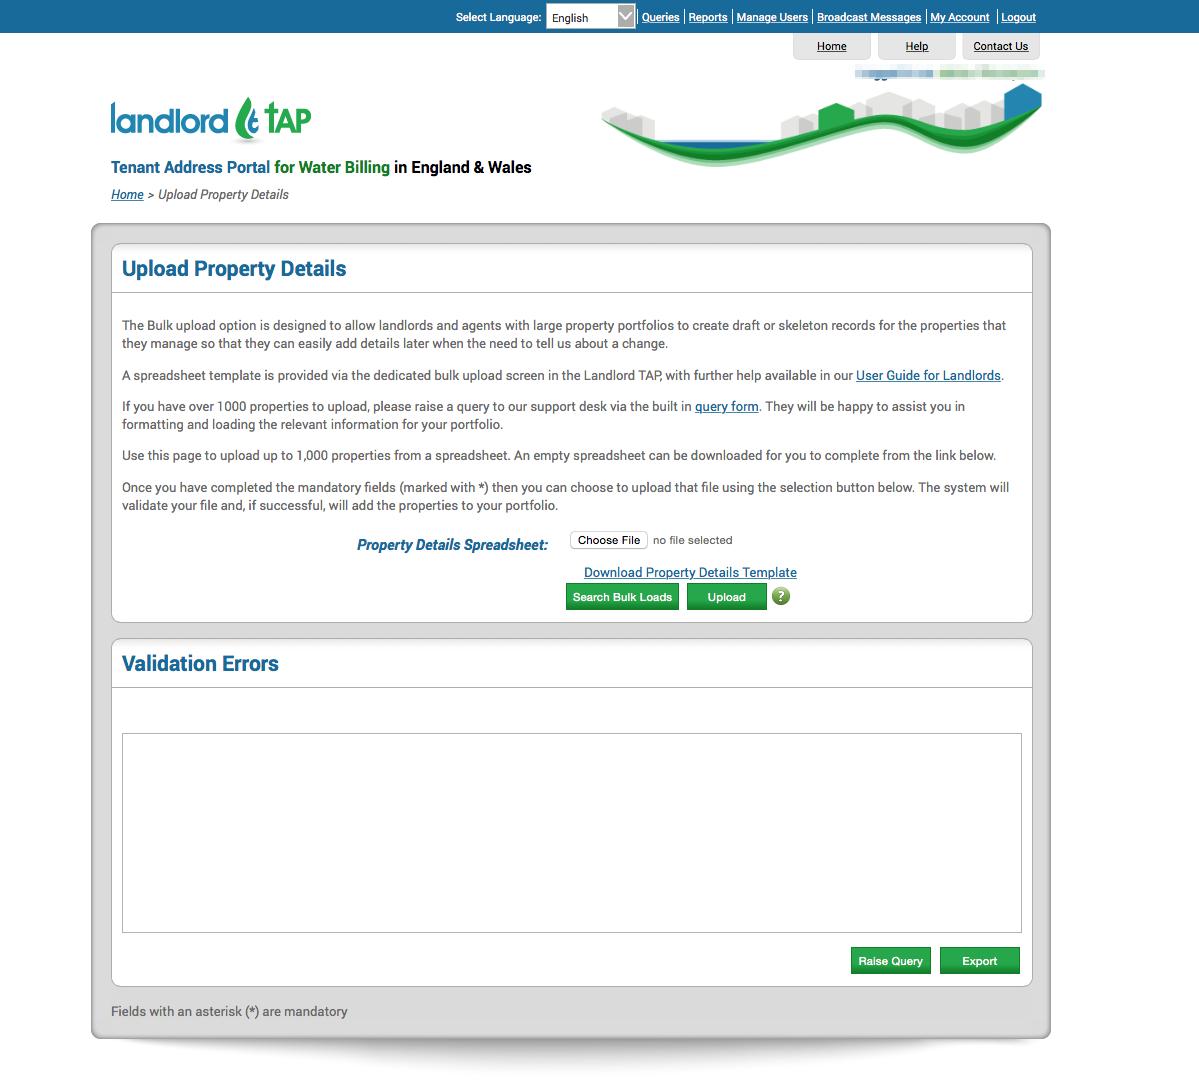 Tenant Address Portal (www.landlordtap.com) bulk upload page